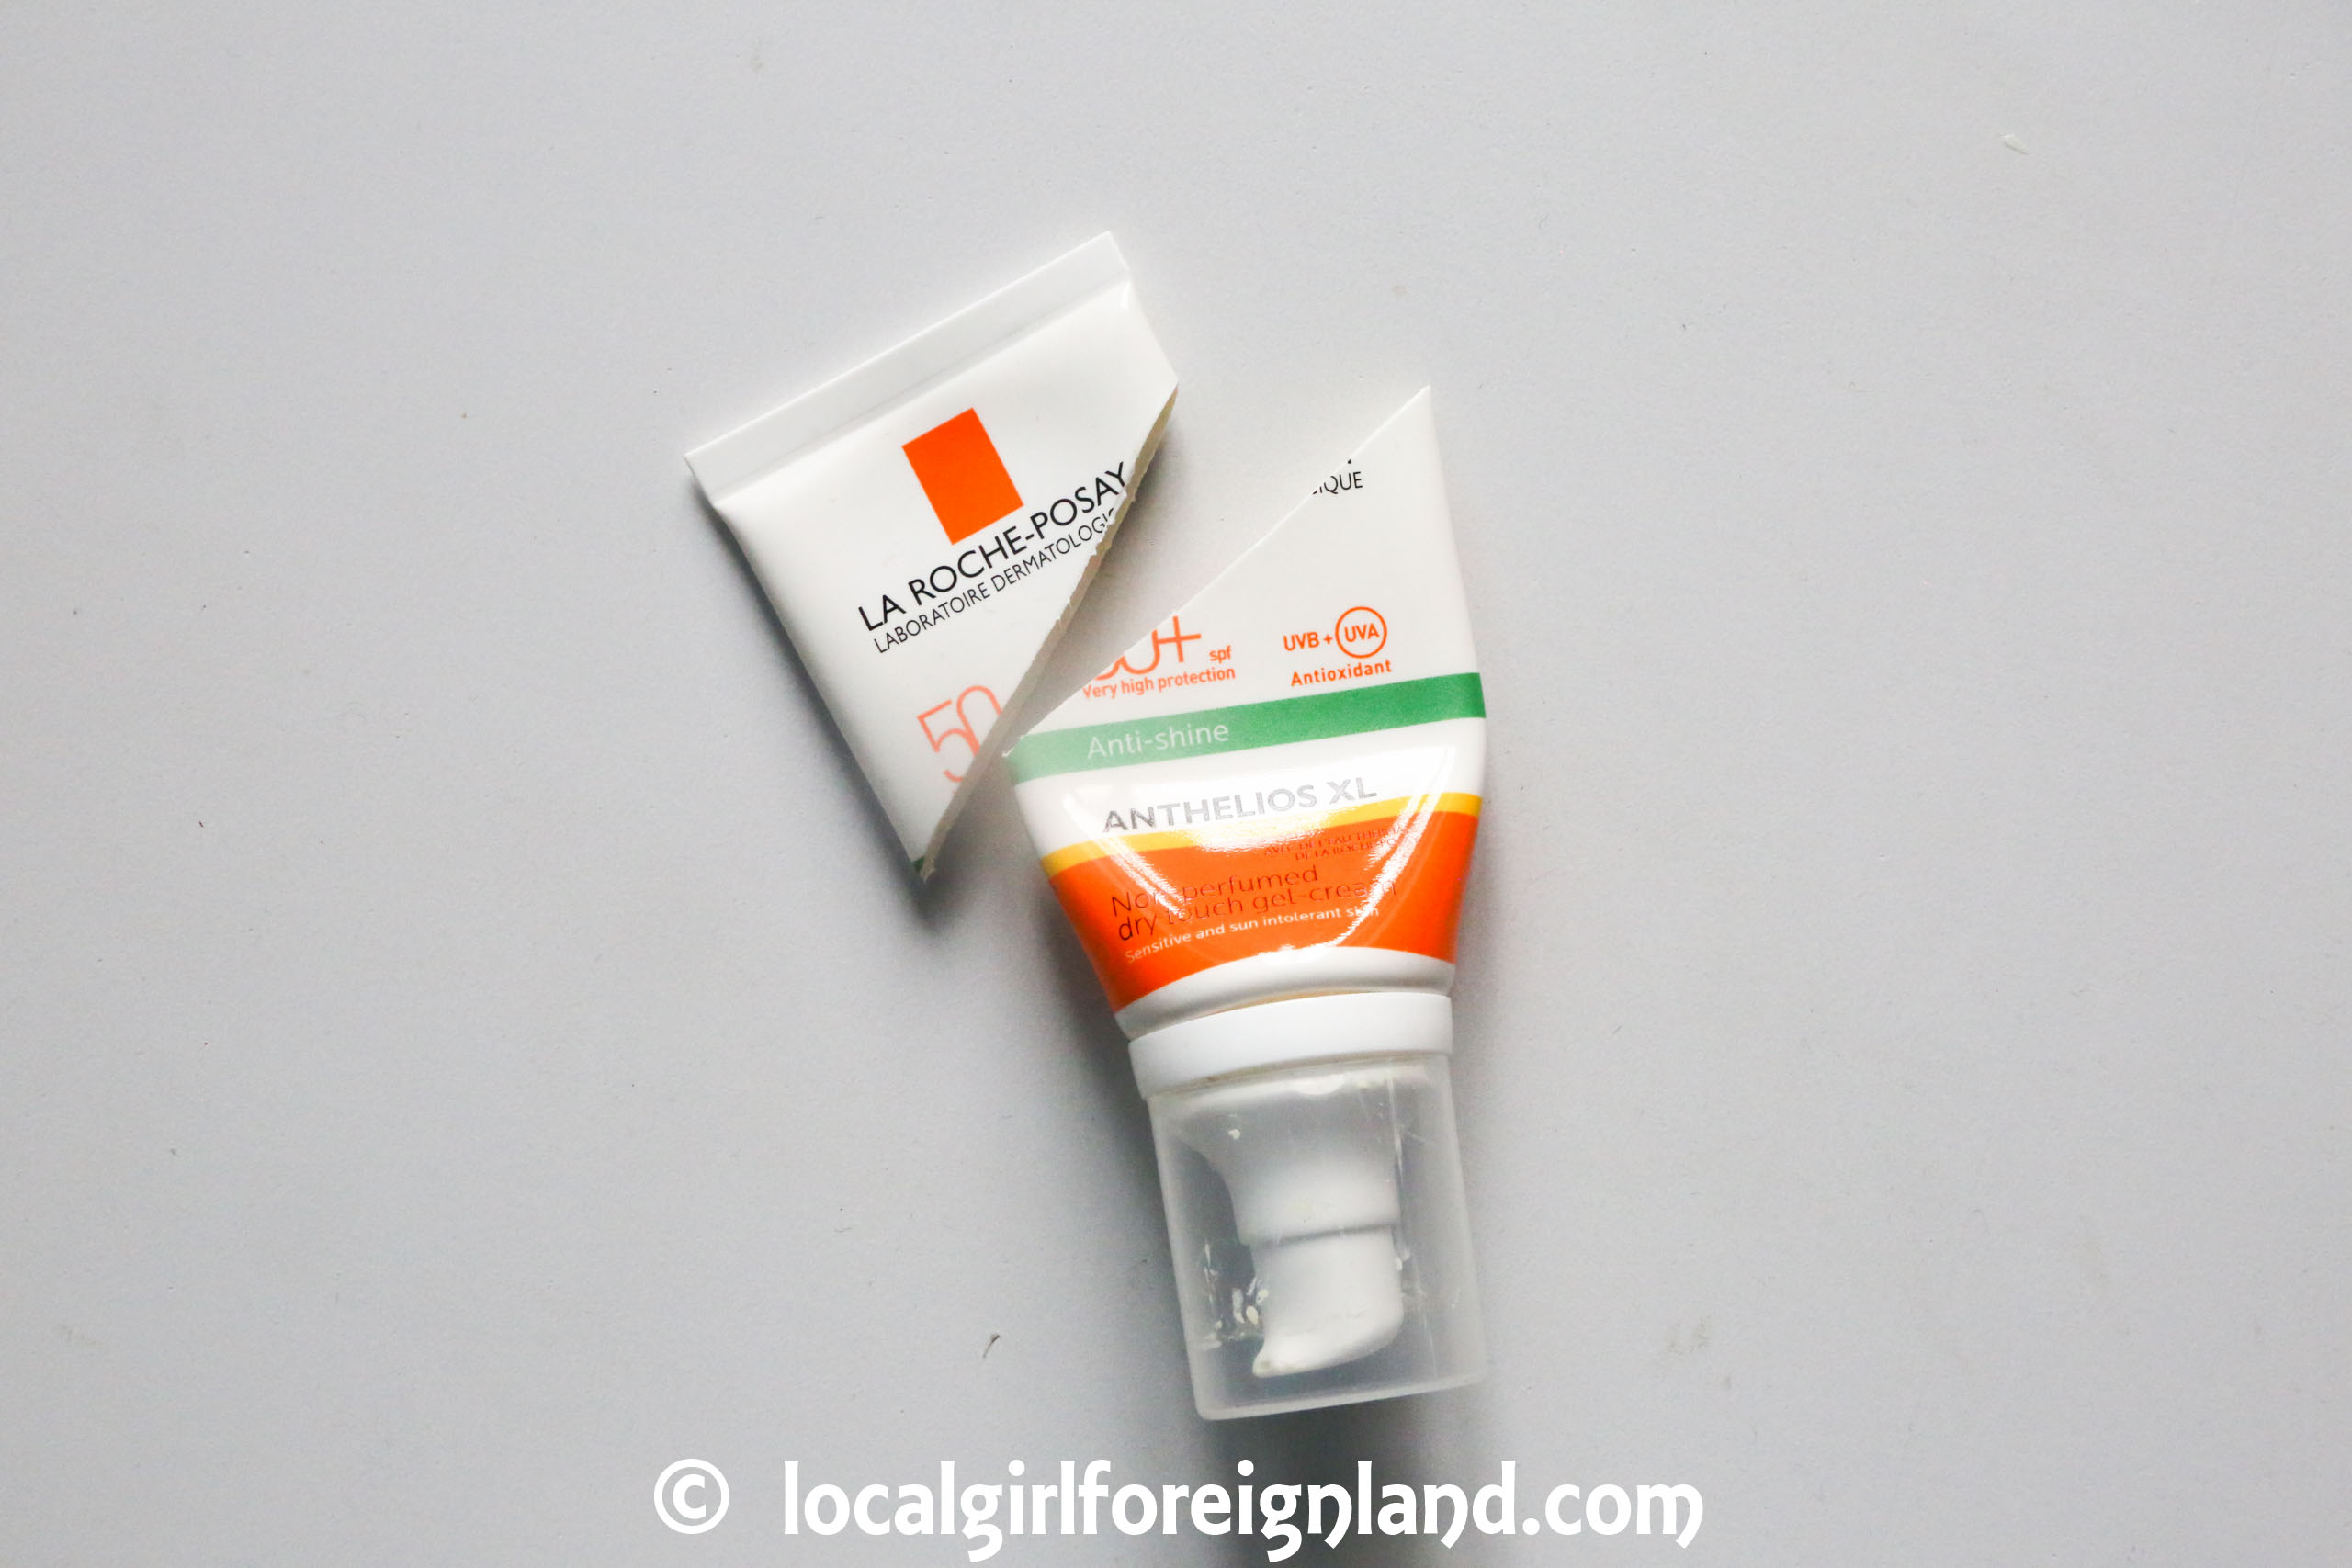 La Roche-Posay Anthelios XL non-perfumed dry touch anti-shine gel-cream